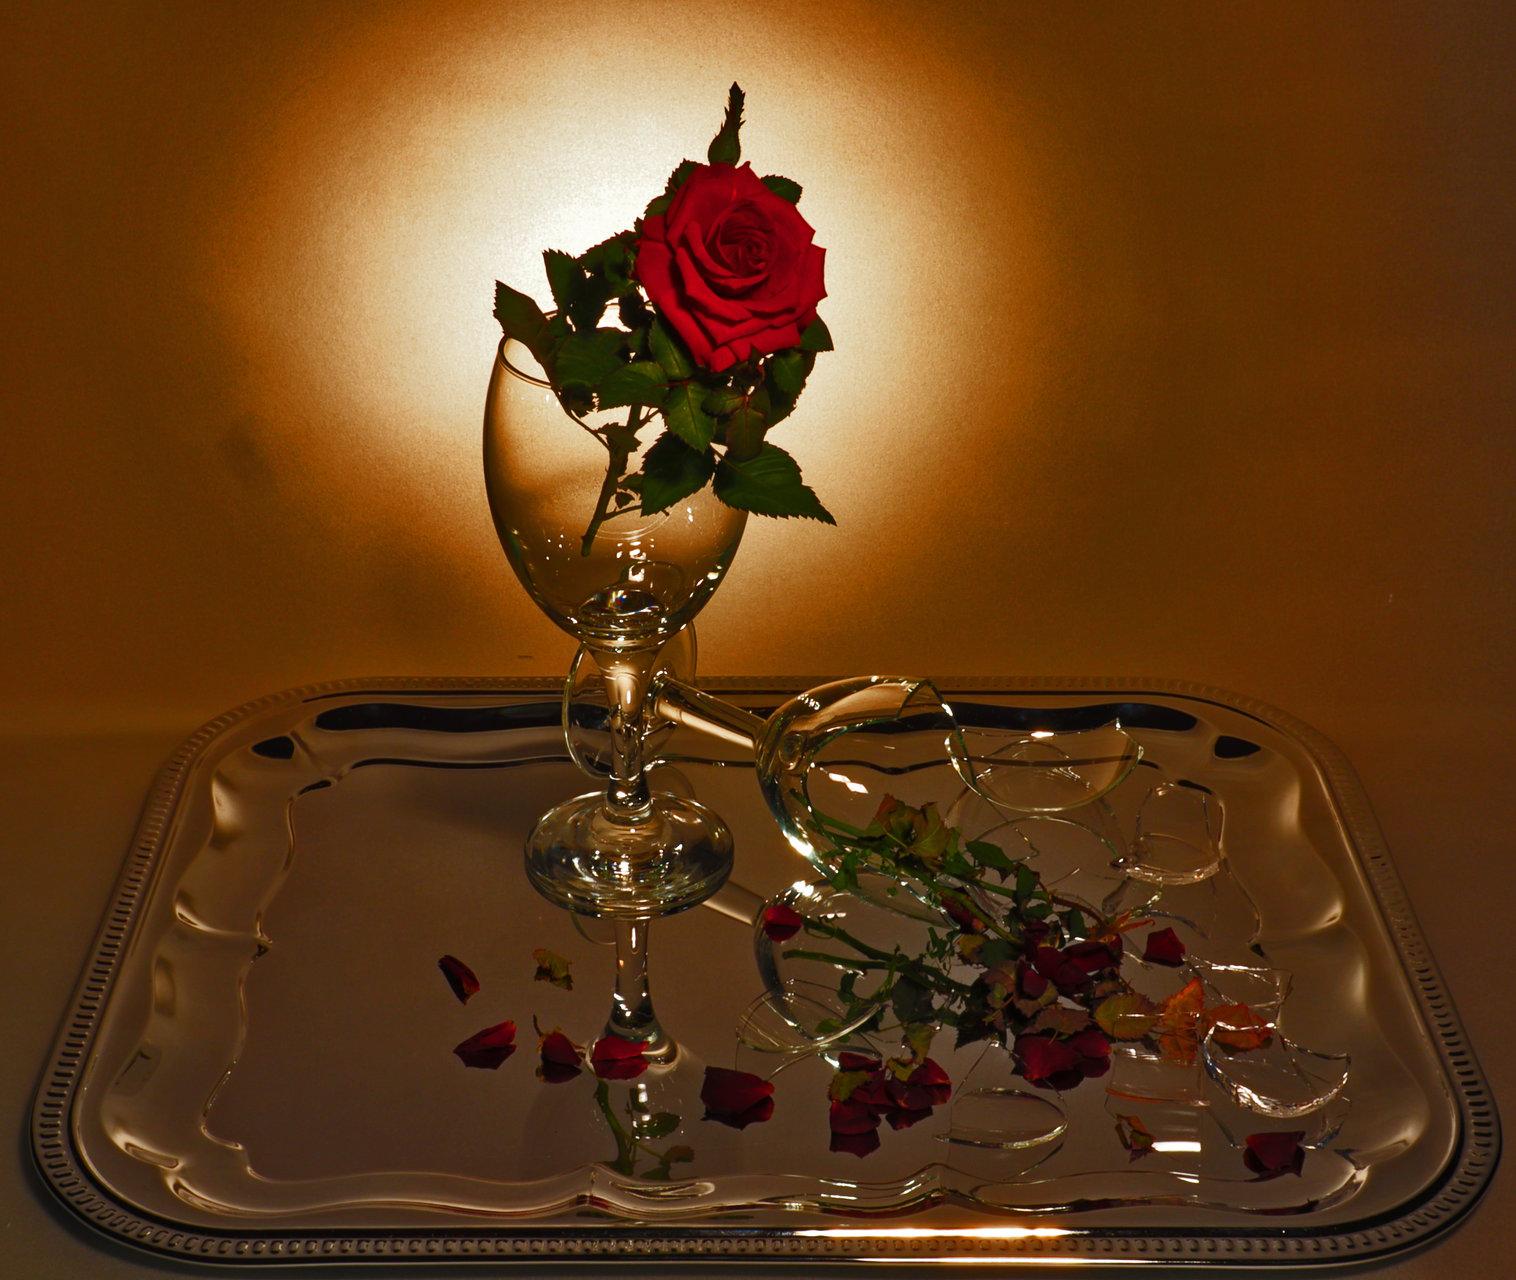 Стъкла и цветя | Author Roza Kenarova - Rozaly_photography | PHOTO FORUM